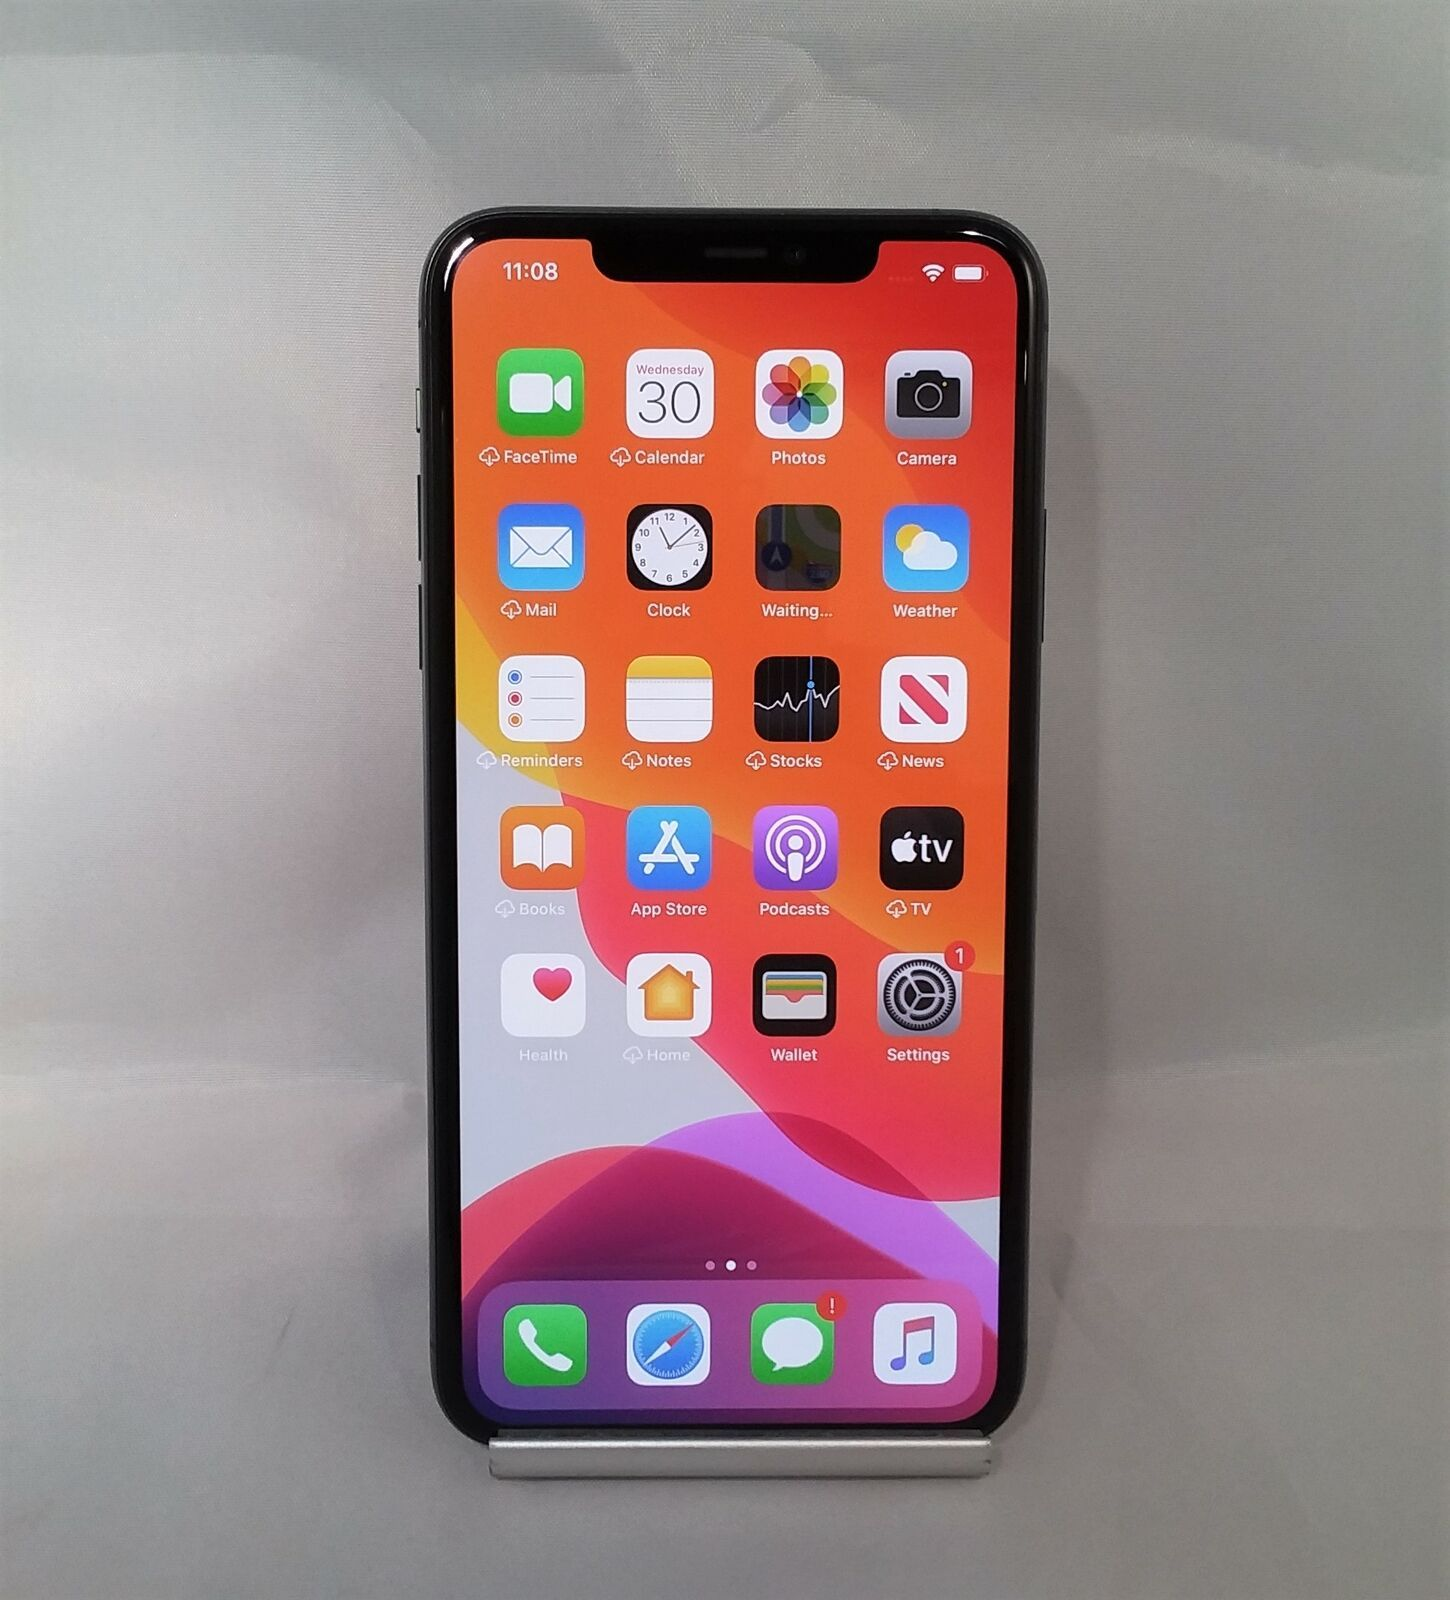 Apple Iphone 11 Pro Max 64gb Midnight Green Sprint Excellent Condition In 2020 Apple Iphone Iphone Iphone 11